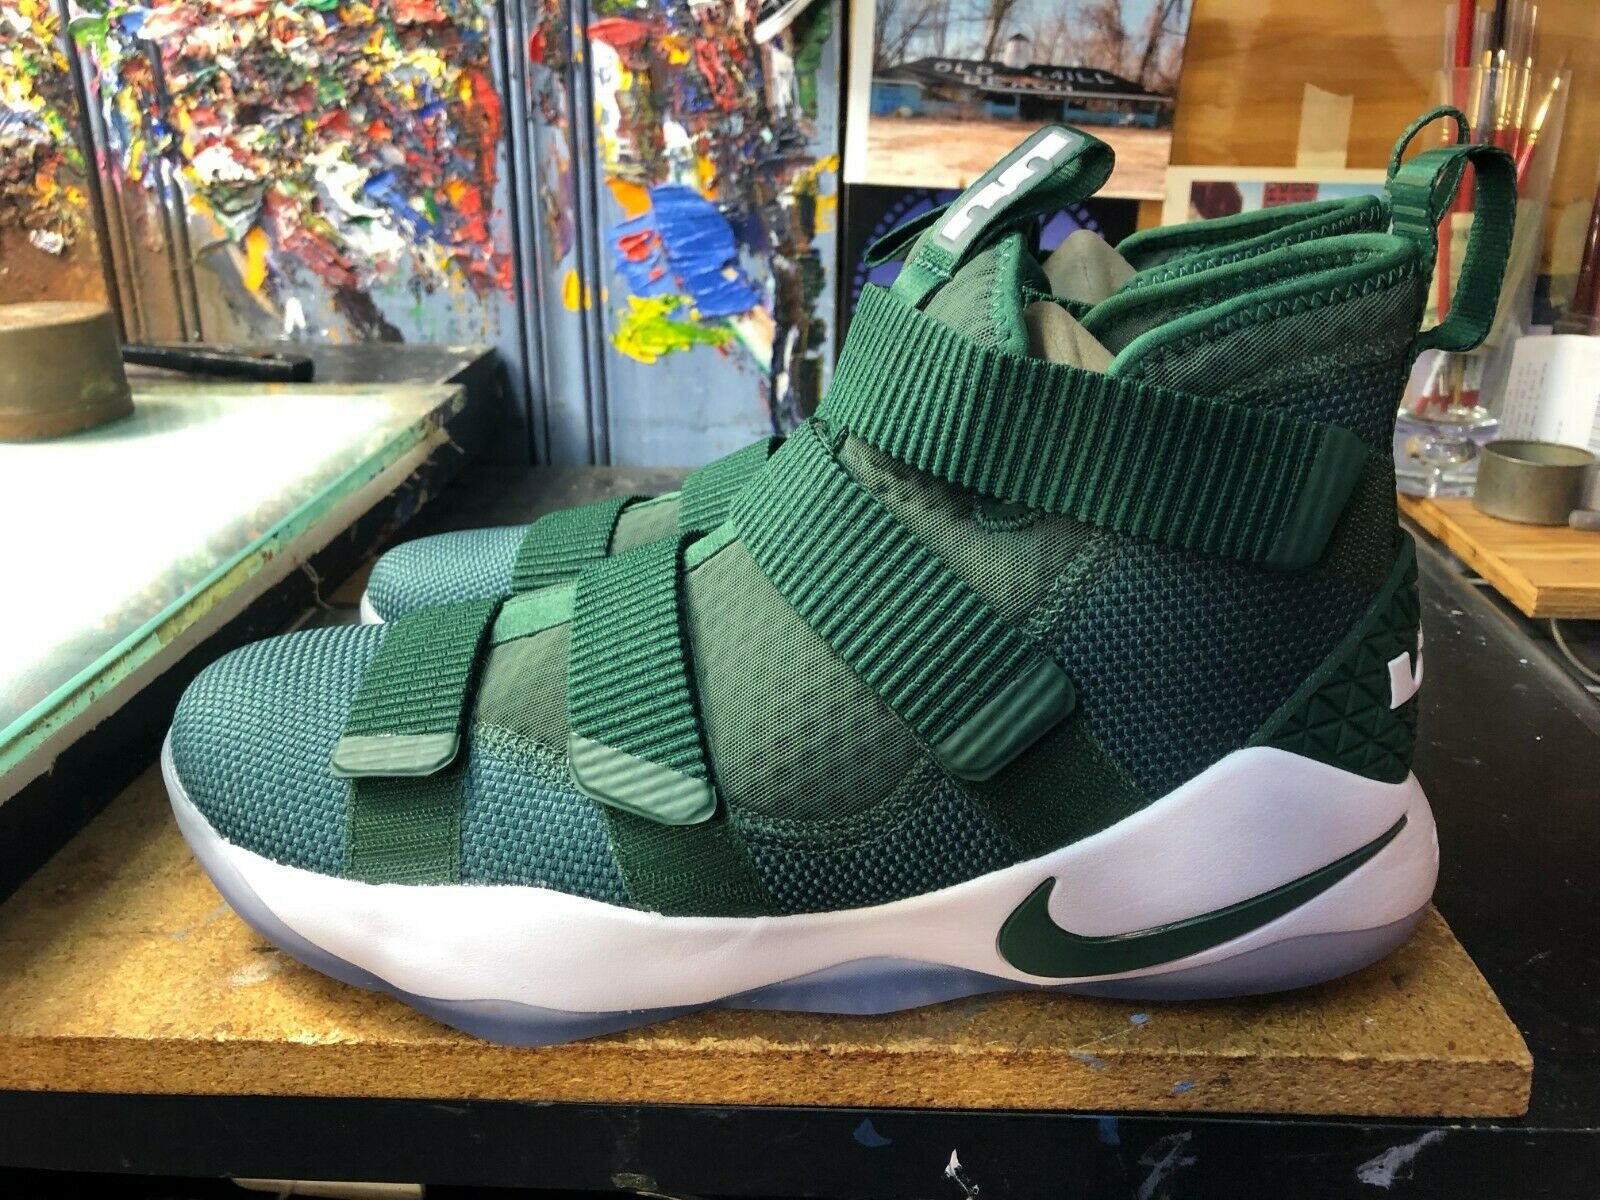 043319bafe7 Nike LeBron Soldier XI TB Promo Promo Promo Fir Green White Size US 11 Men  943155